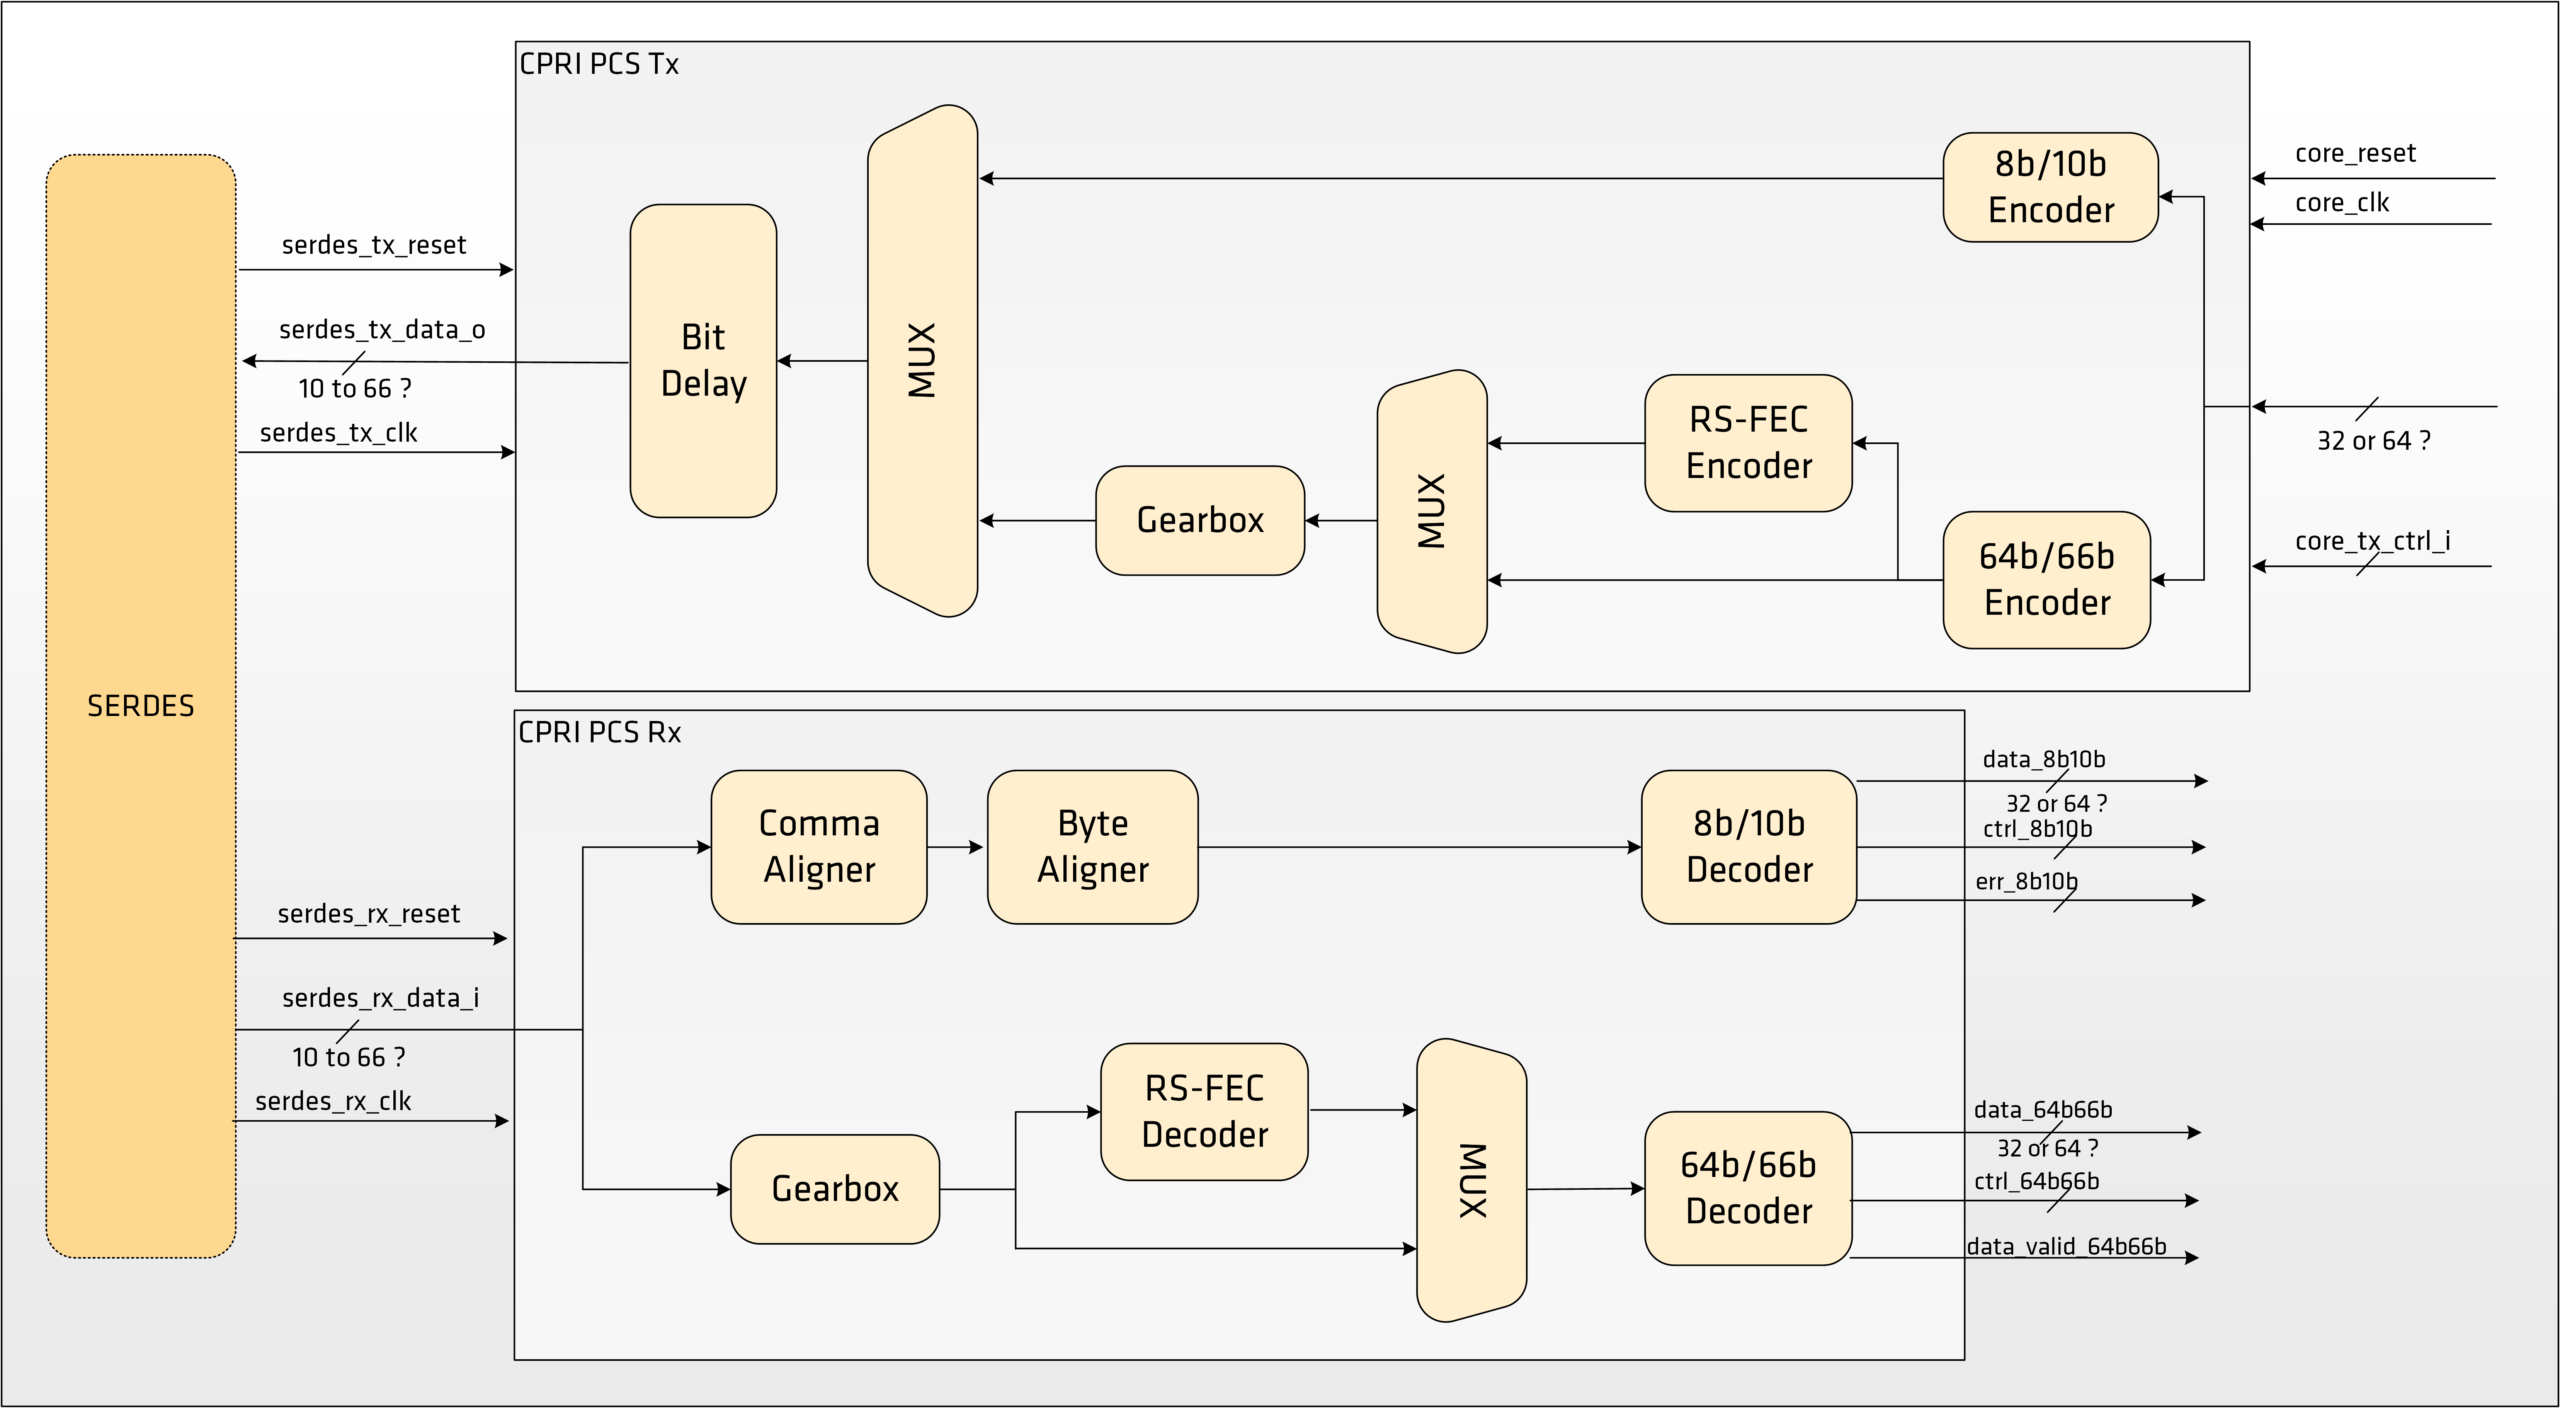 CPRI 7.0 PCS Block Diagram